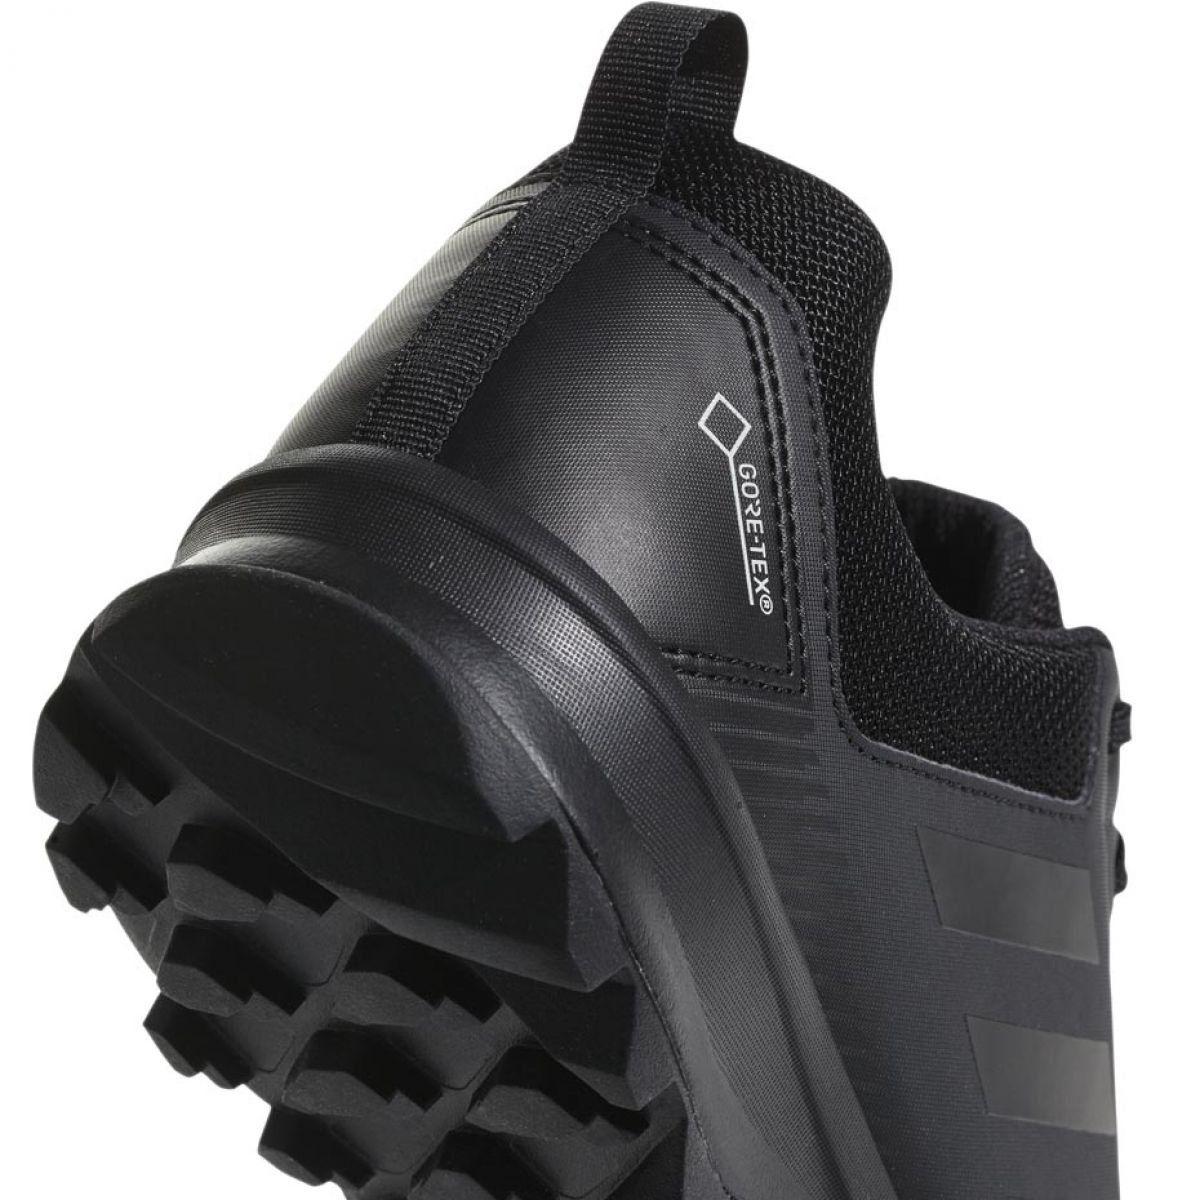 Buty Adidas Terrex Tracerocker Gtx M Cm7593 Czarne Black Shoes Sports Shoes Adidas Trekking Shoes